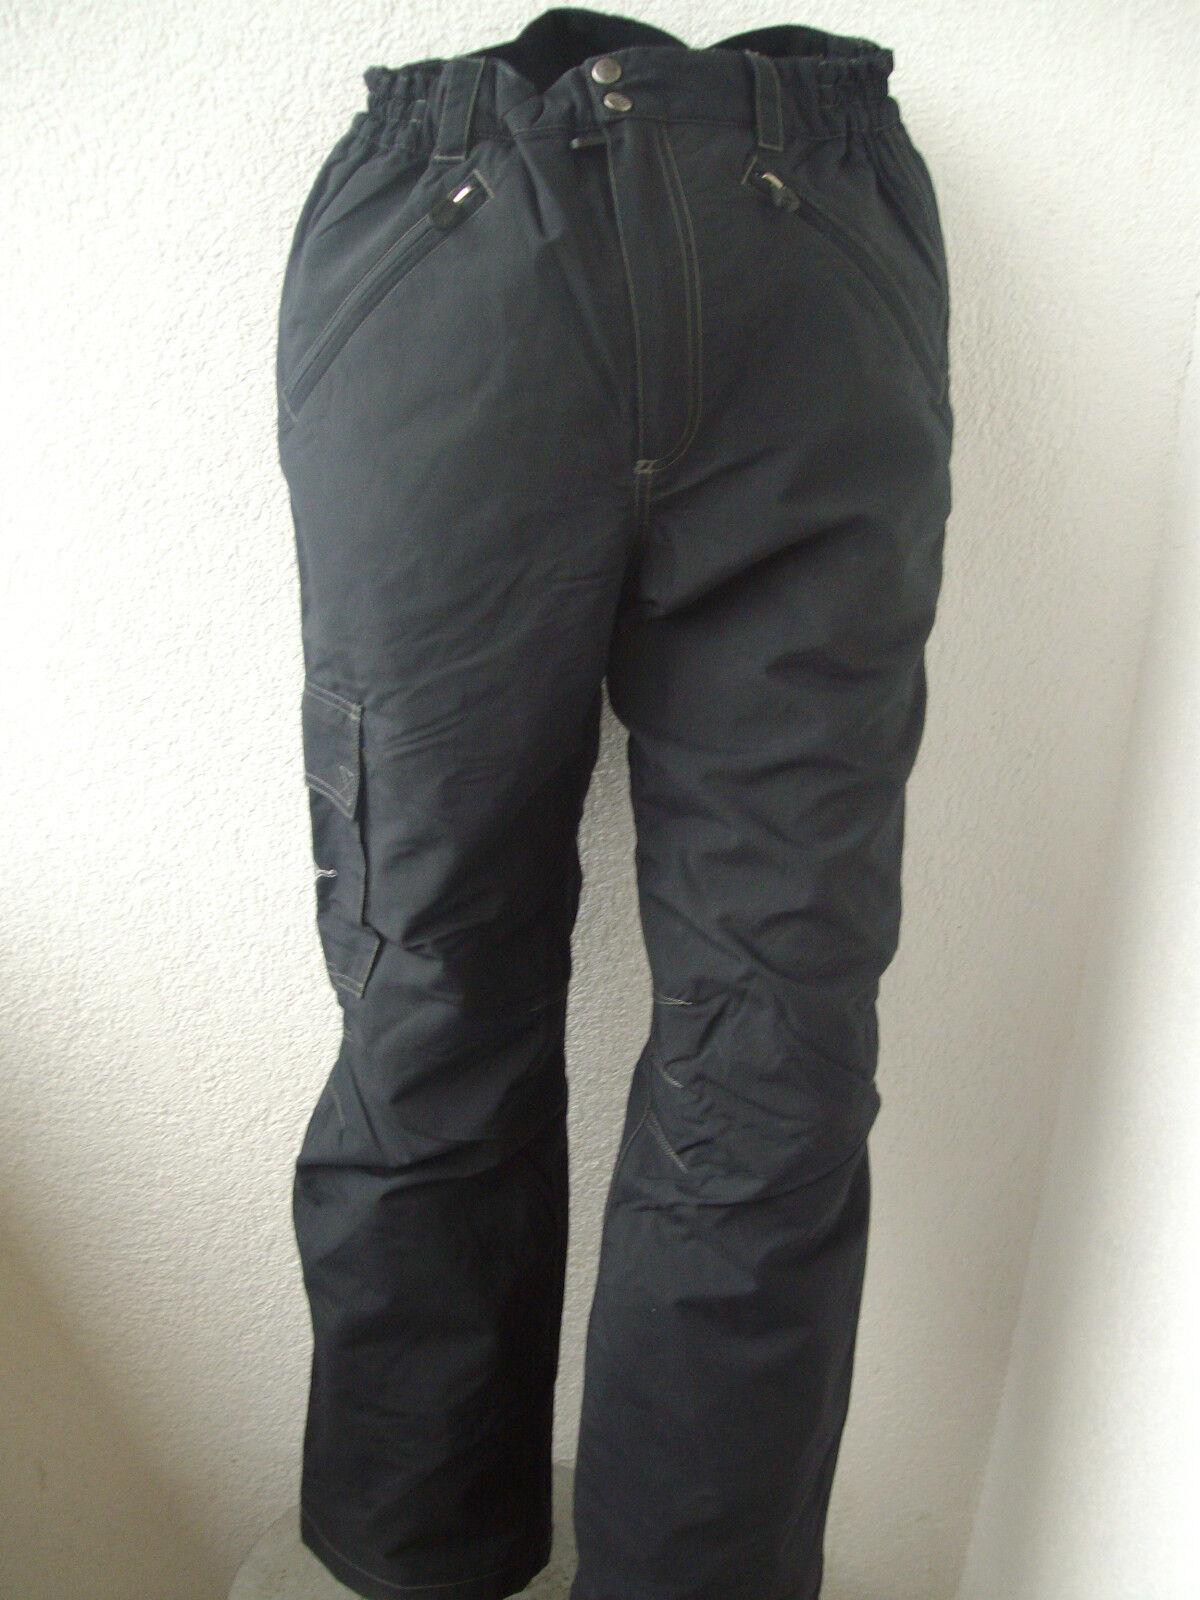 Oxbow Snowboardhose, Snowboard schwarz, Hose, Skihose, schwarz, Snowboard Gr. XL c3fb5a